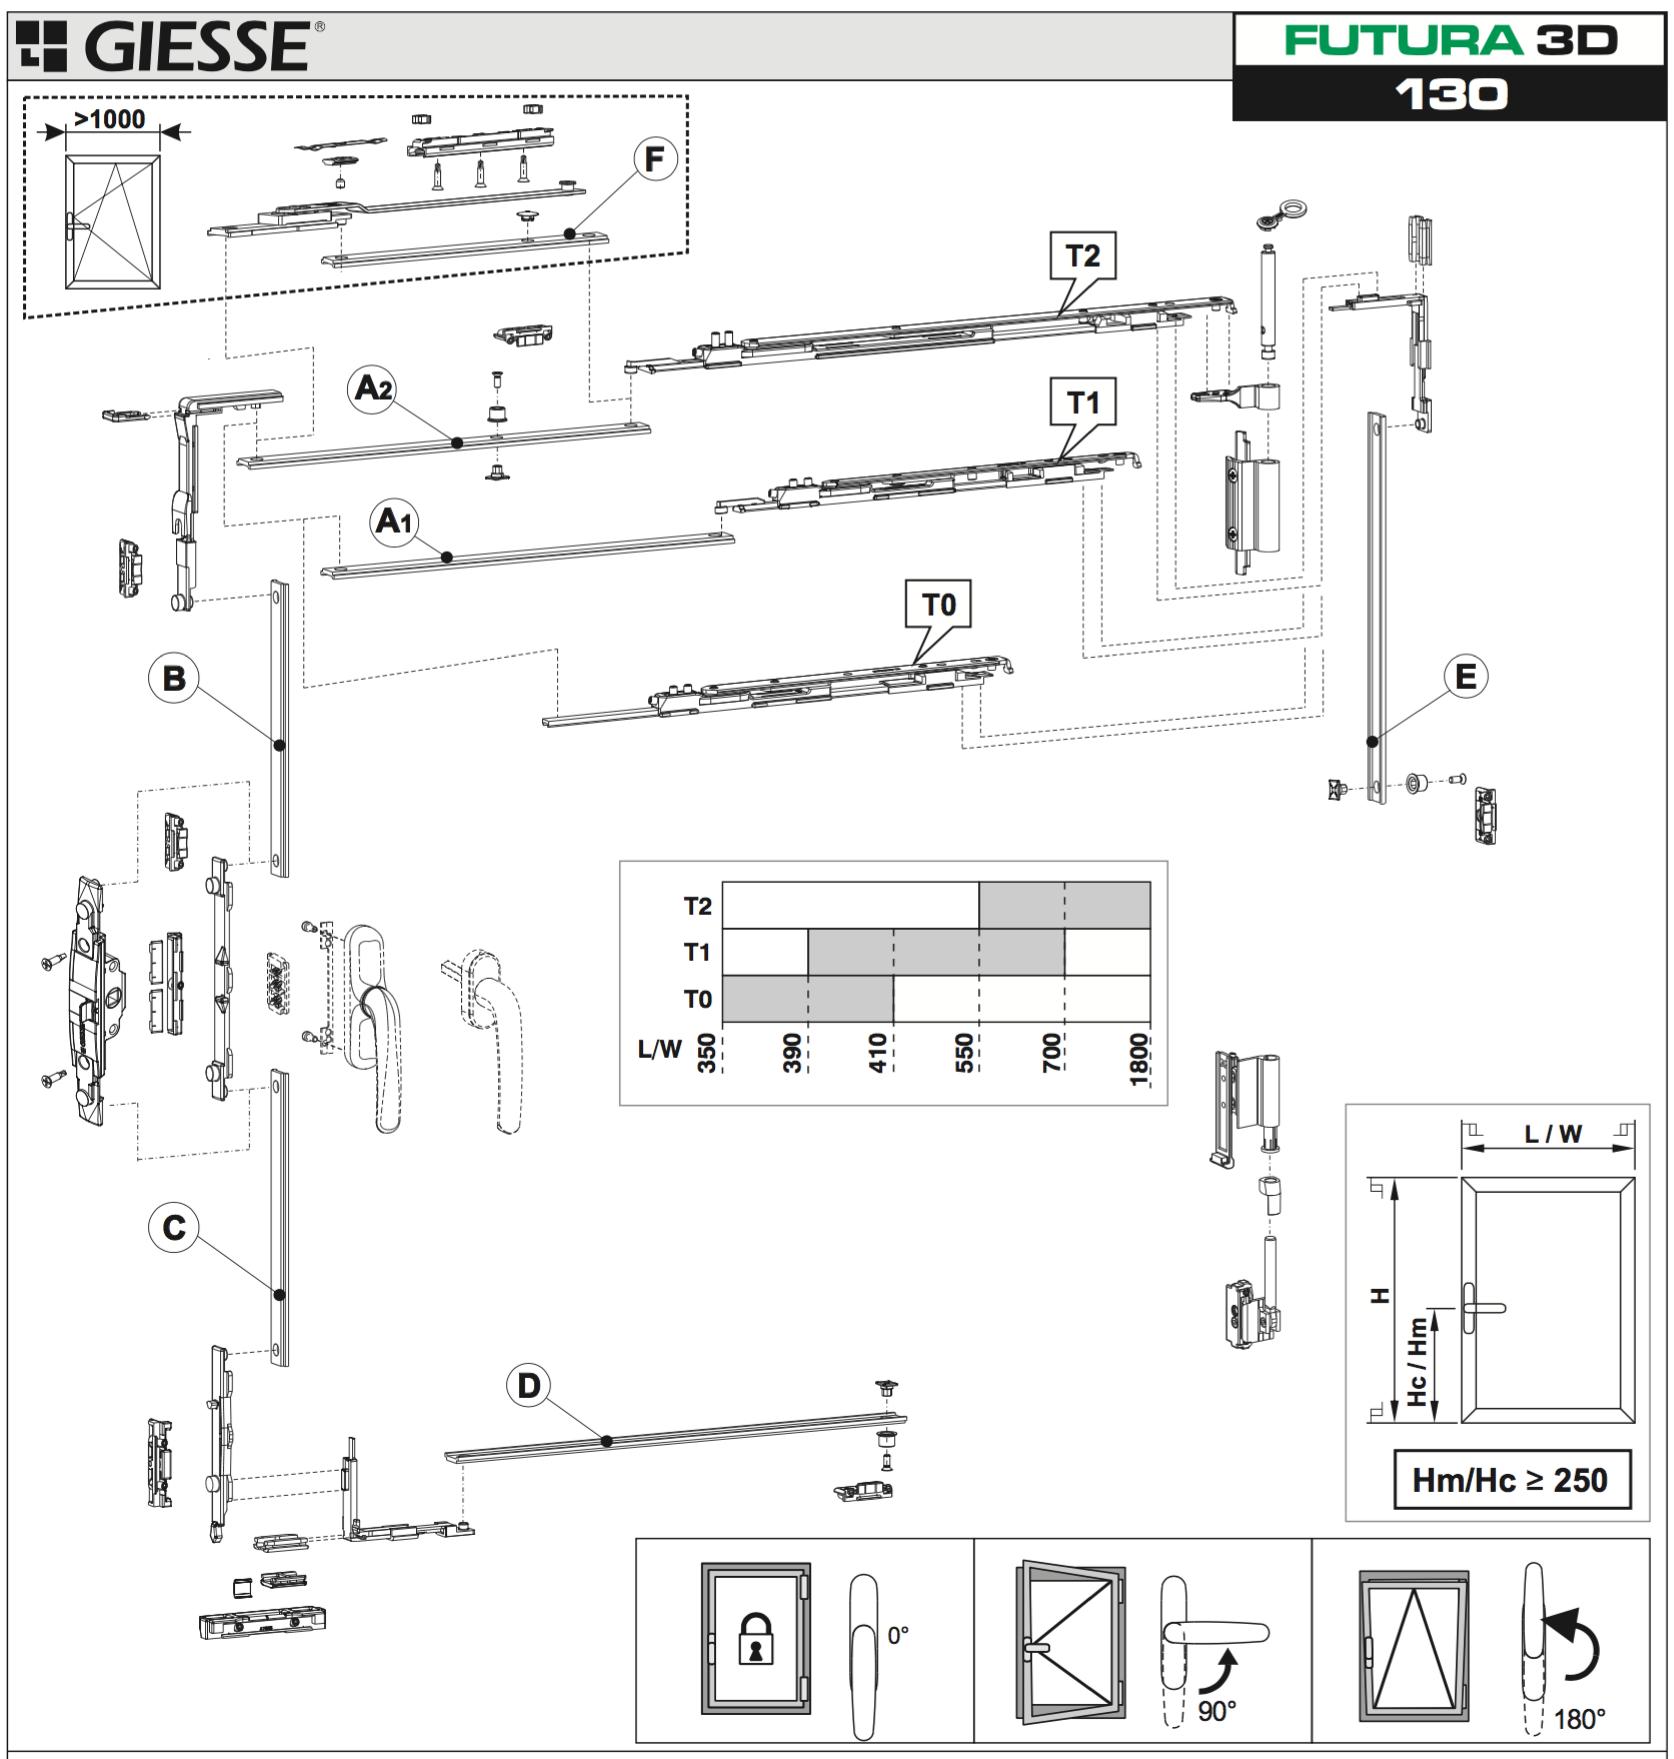 Acquista anta ribalta giesse futura 3d per martellina base - Finestra vasistas meccanismo ...